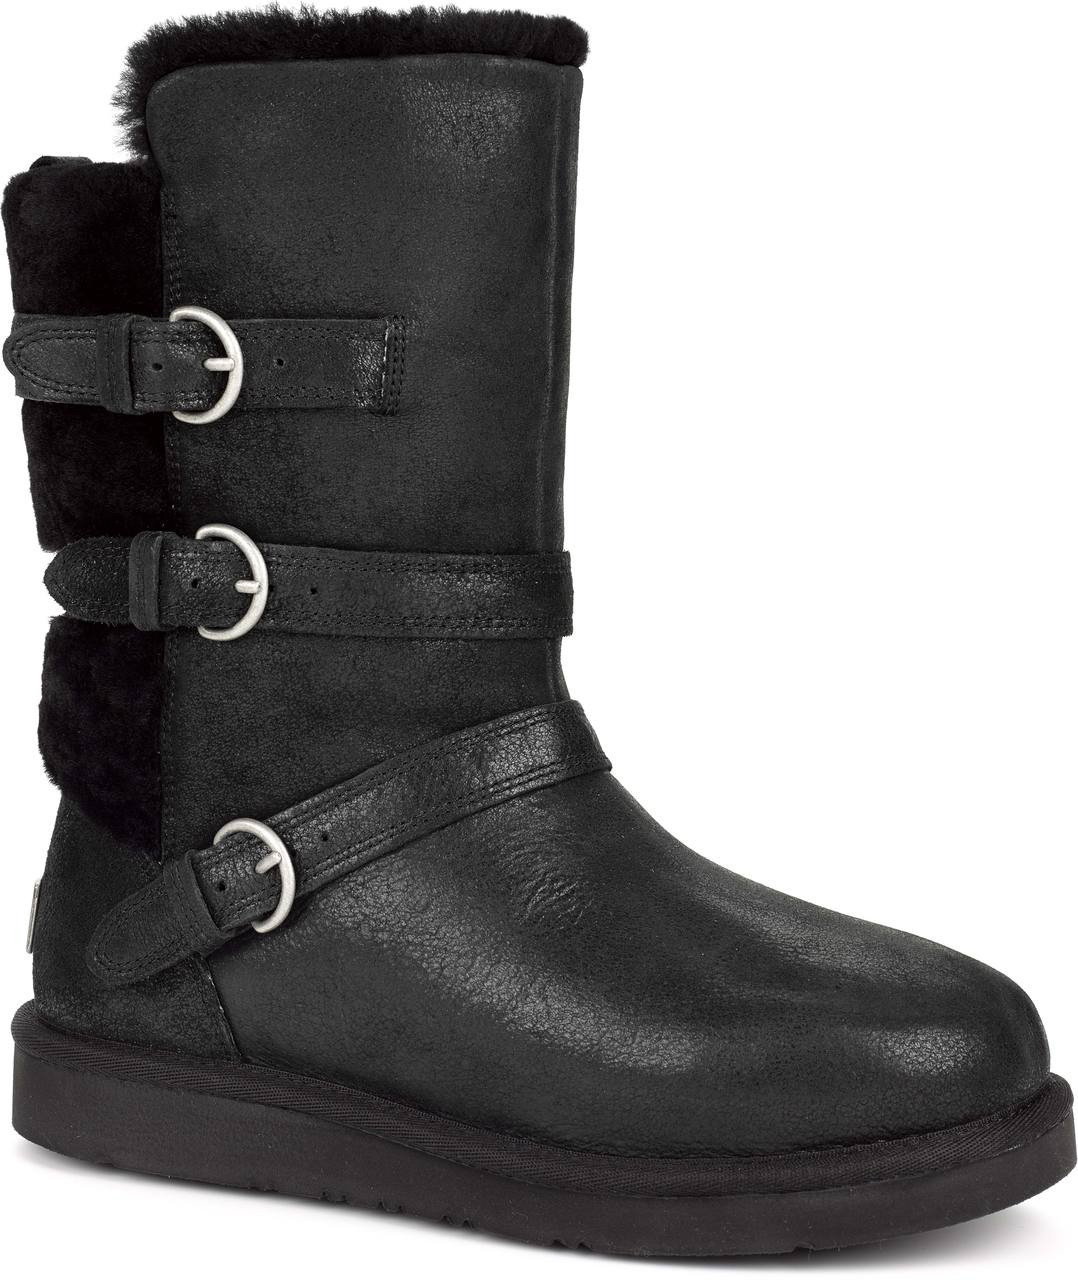 ebe7d1e31f1 Womens Ugg Australia Black Becket Boots - cheap watches mgc-gas.com